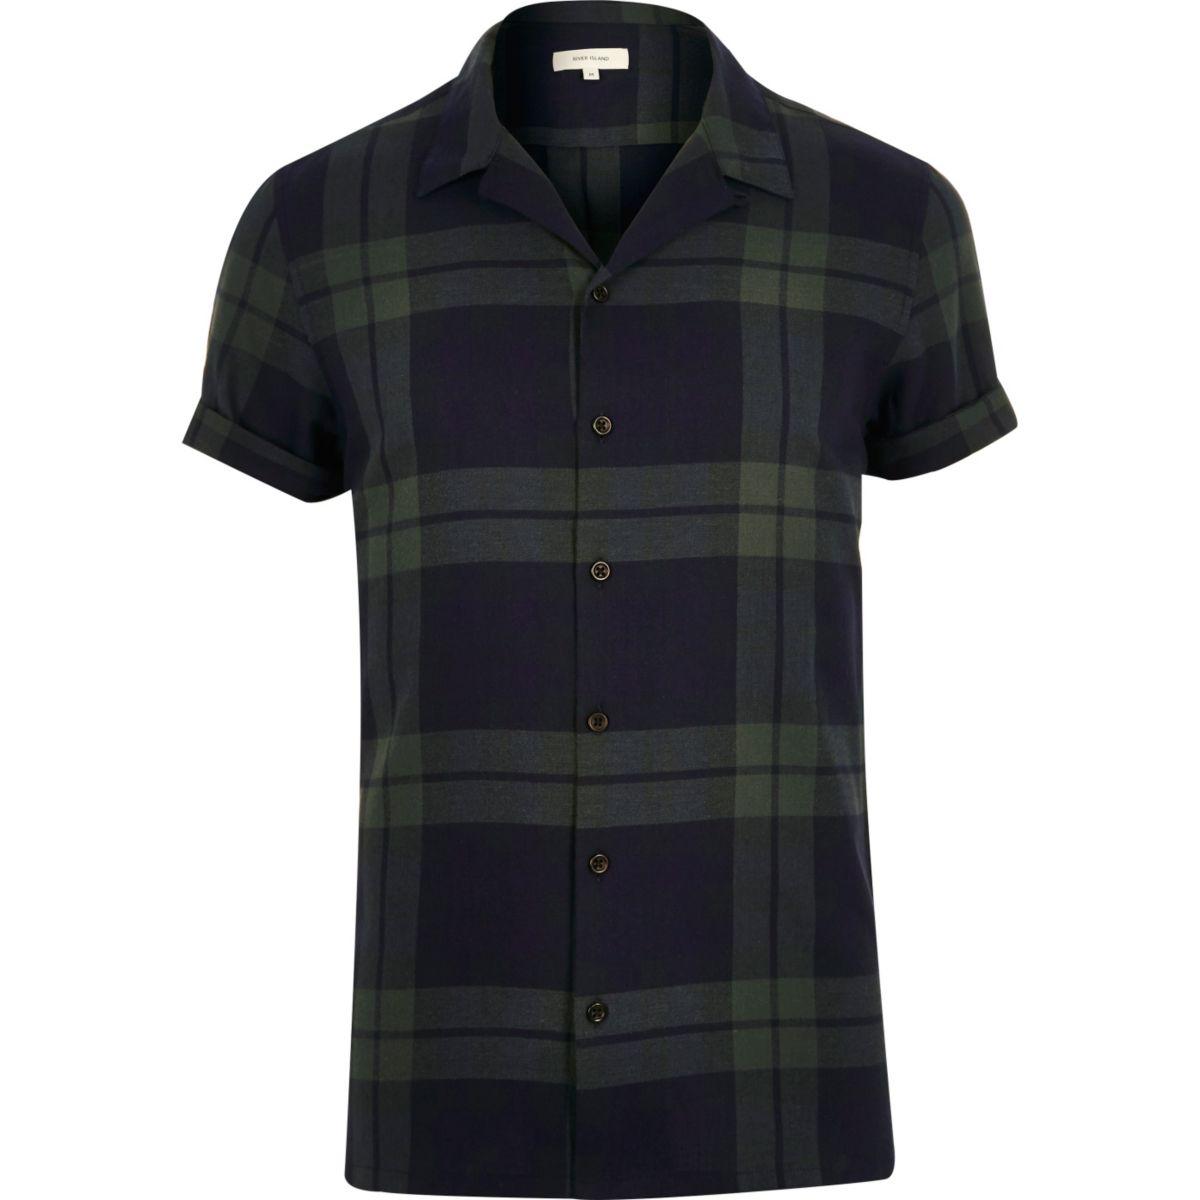 Green check revere collar shirt